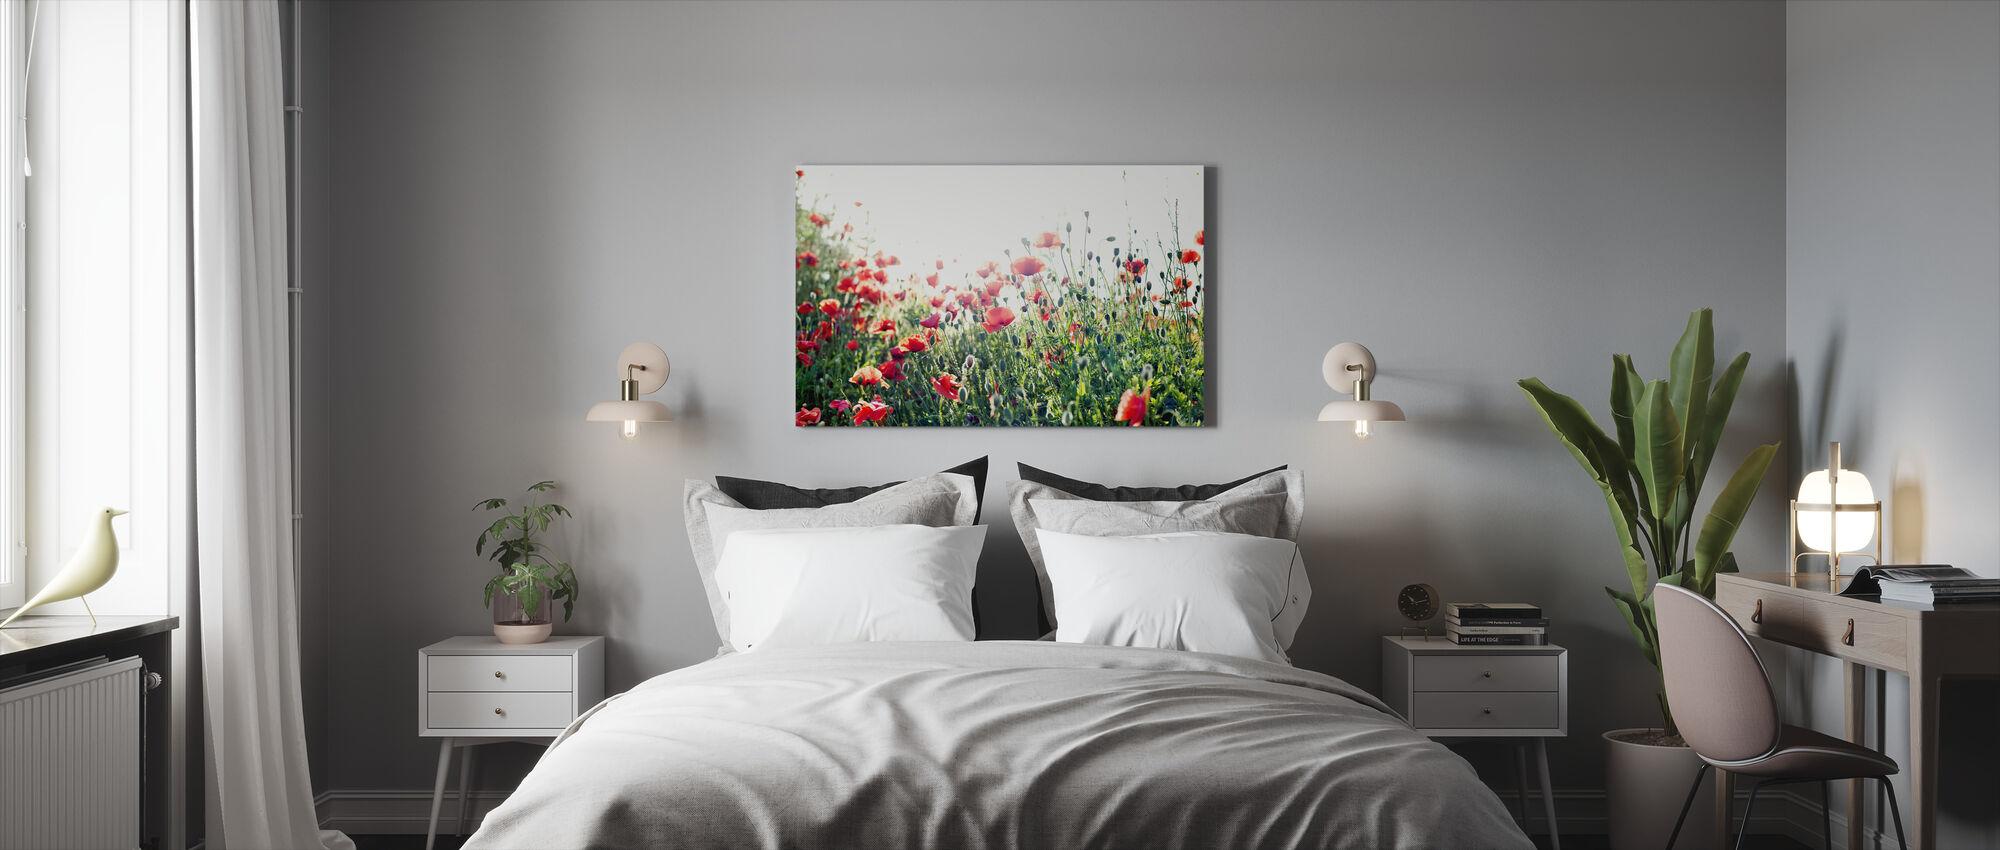 Gotland Poppies - Canvas print - Bedroom